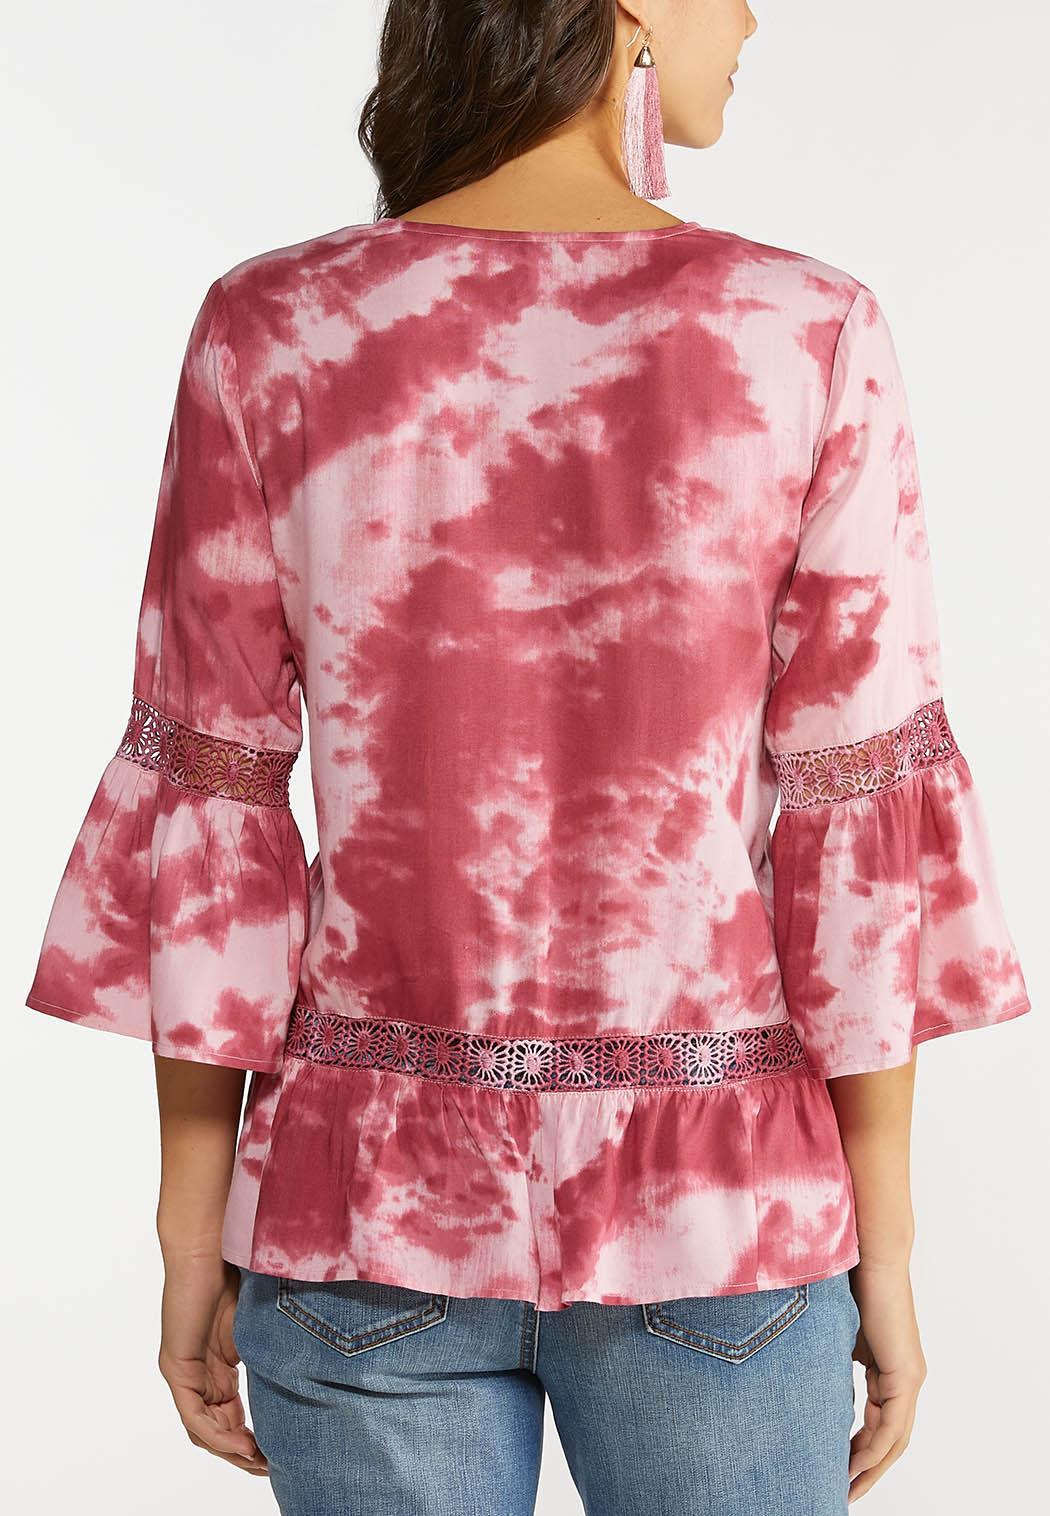 Plus Size Raspberry Tie Dye Top (Item #44104821)